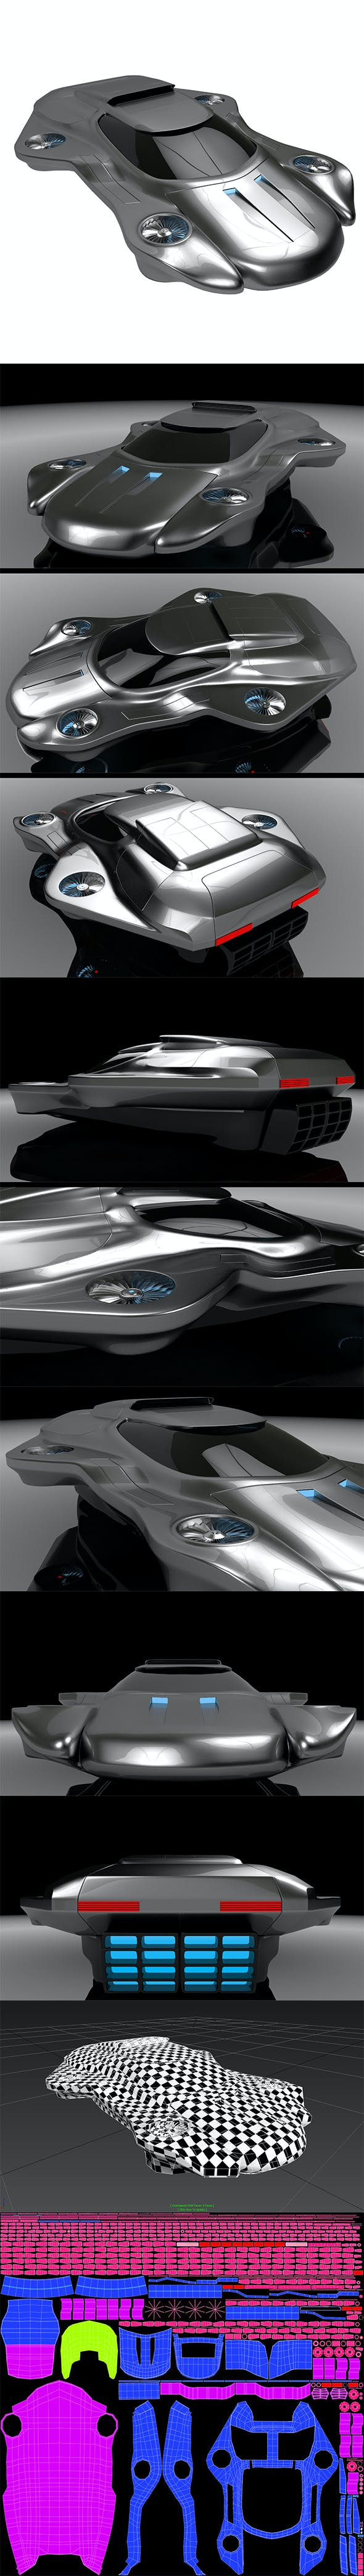 Air machine hover car - 3DOcean Item for Sale